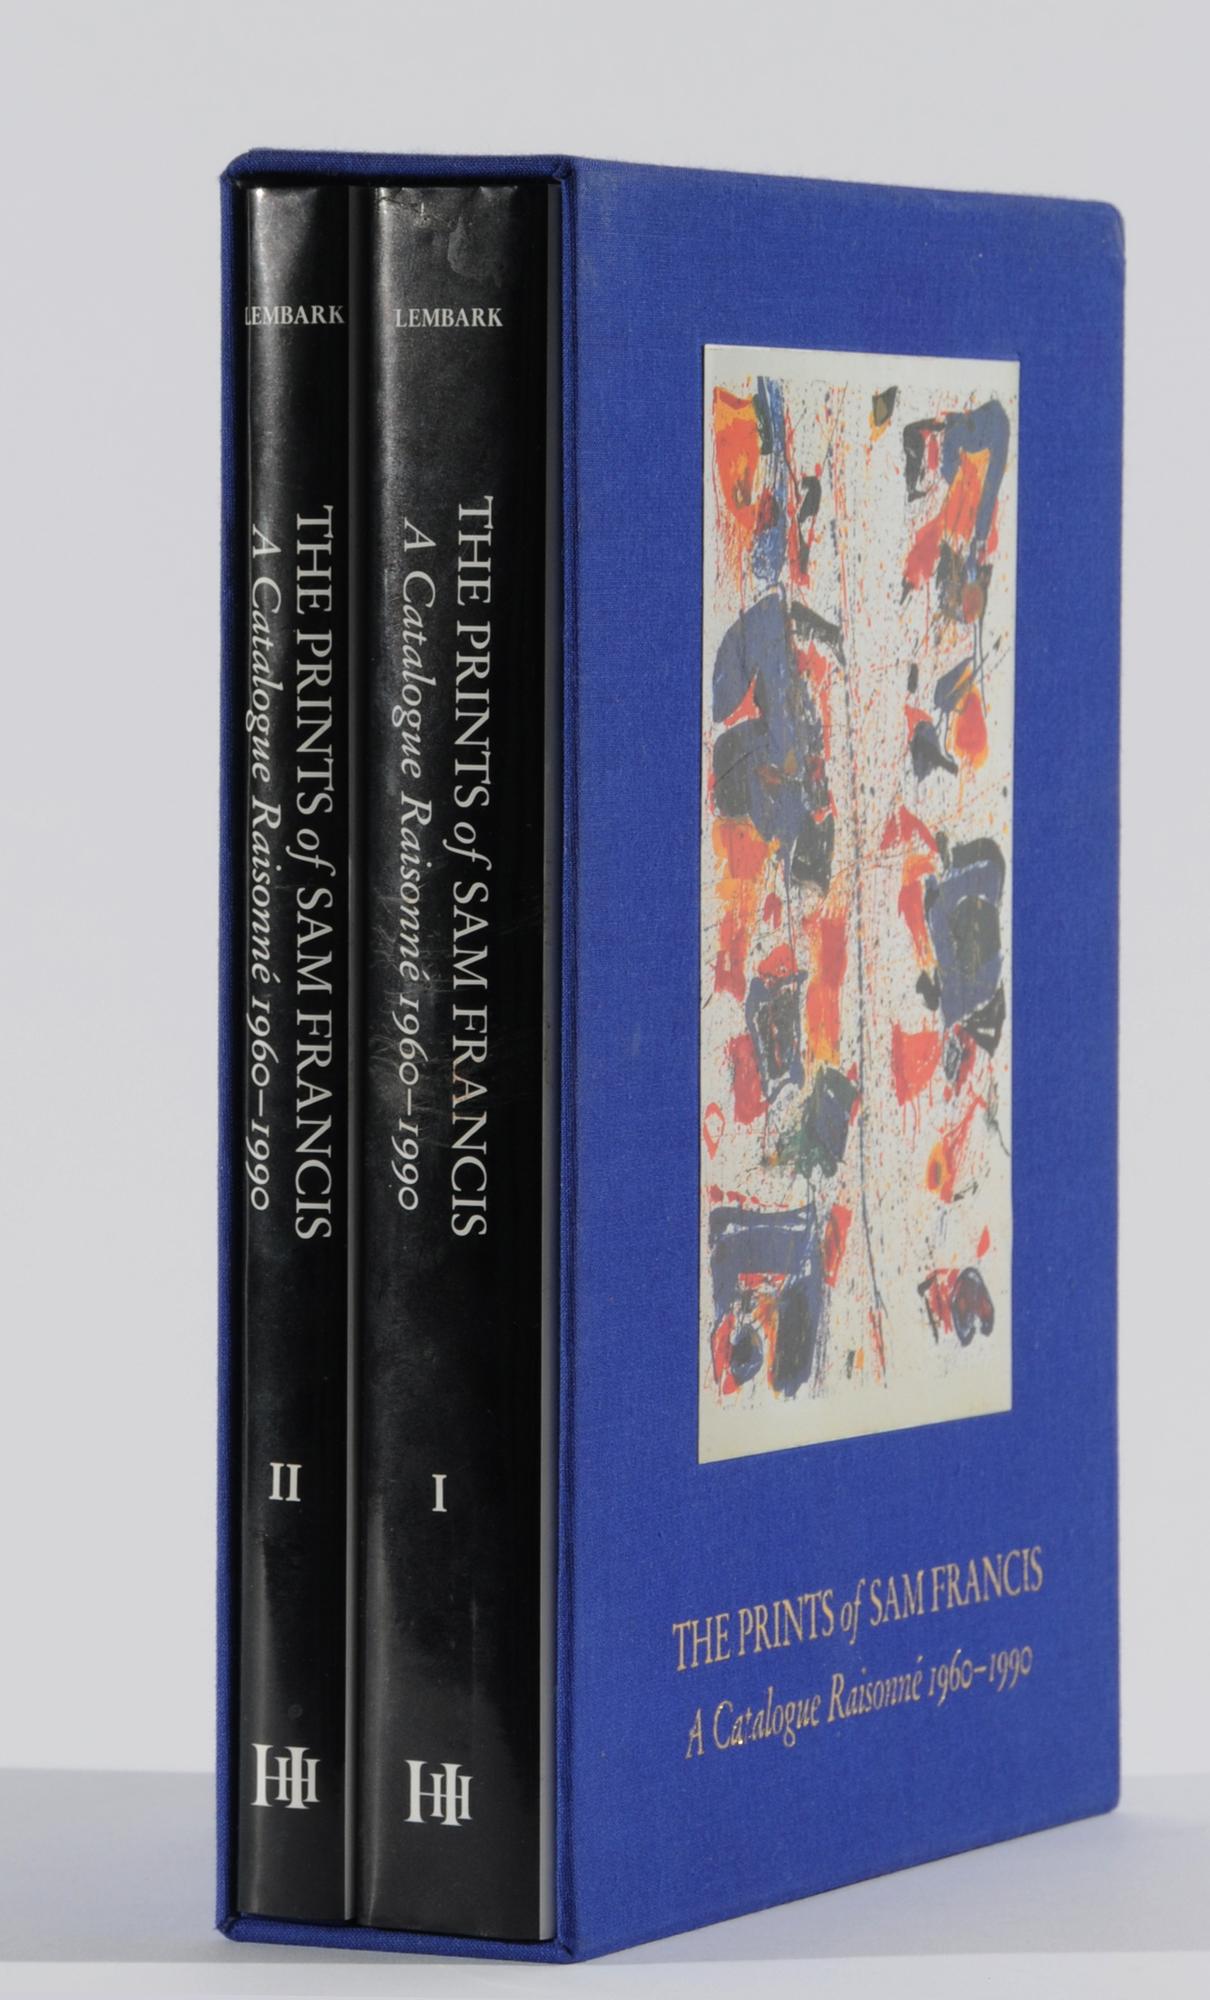 Francis Sam, Catalogue Raisonné: Connie W. Lembark. The Prints of Sam Francis. A Catalogue Raisonné 1960-1990, Volume I & II